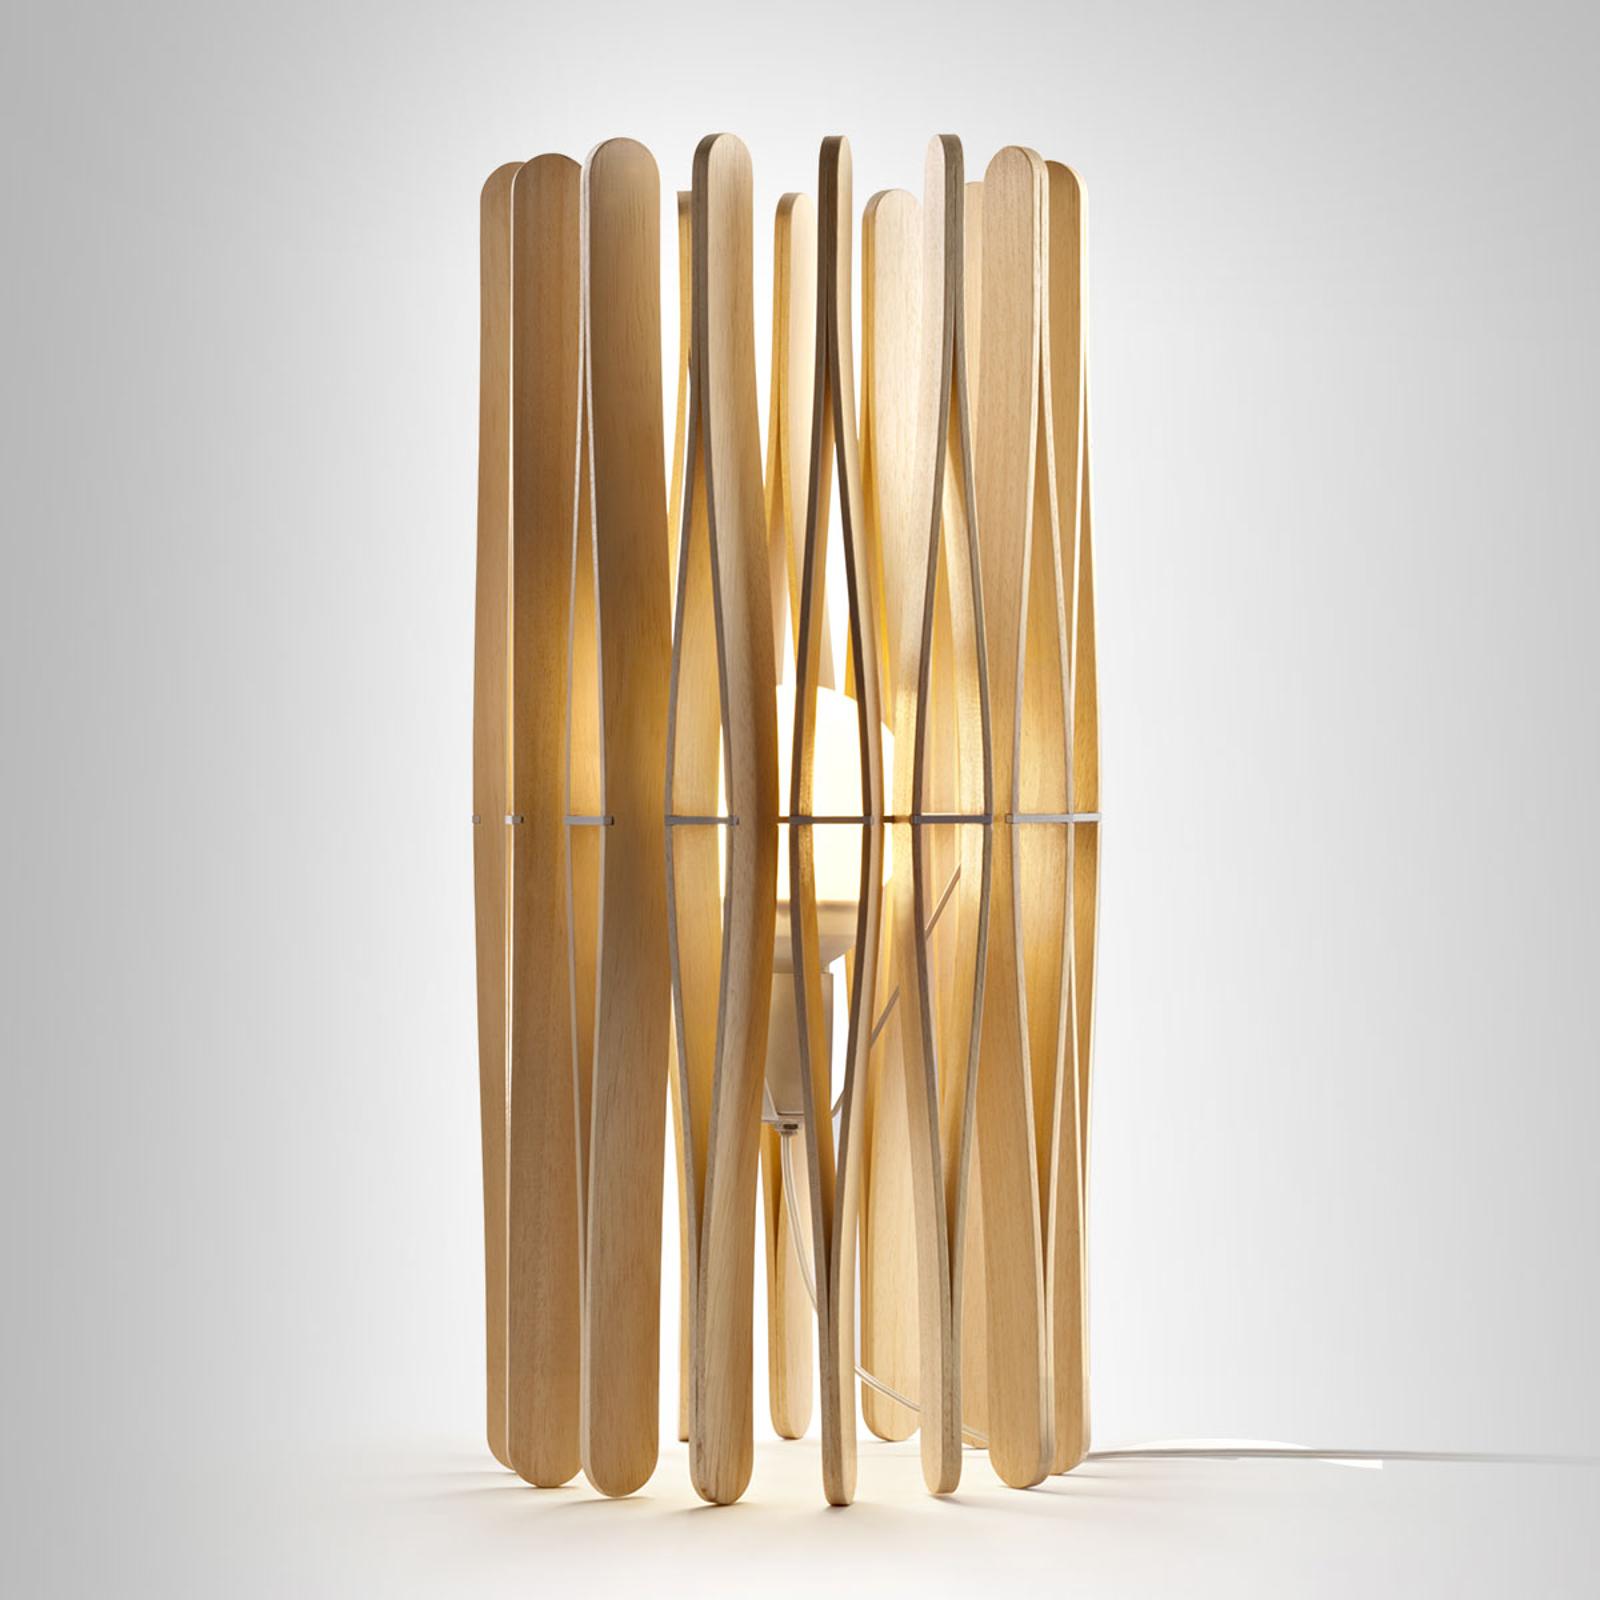 Fabbian Stick houten tafellamp, cilindervormig